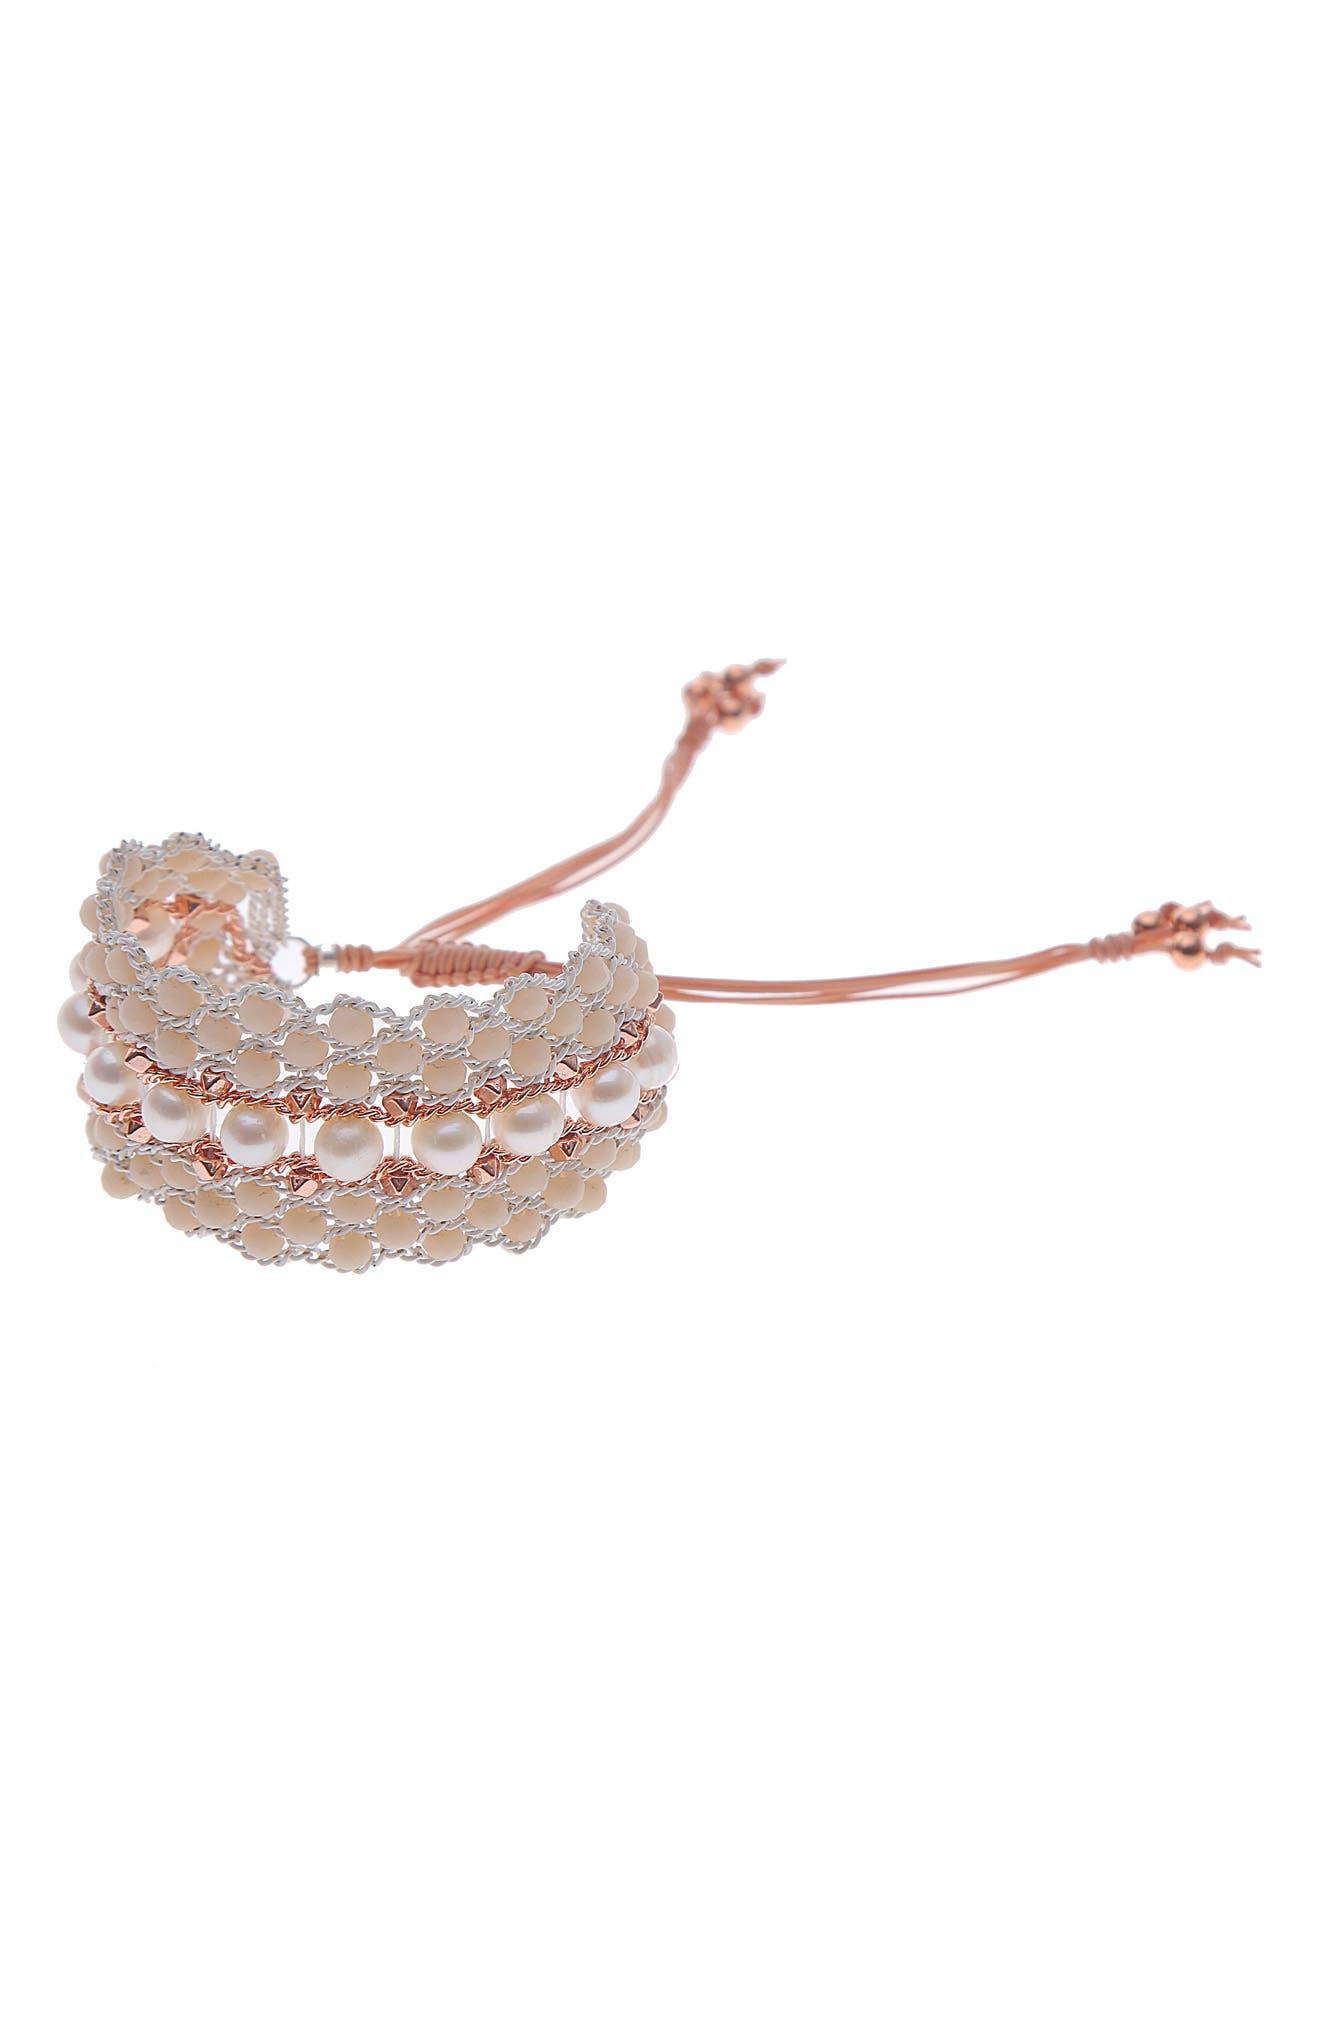 Crochet Crystal & Freshwater Pearl Bracelet,                             Main thumbnail 1, color,                             900